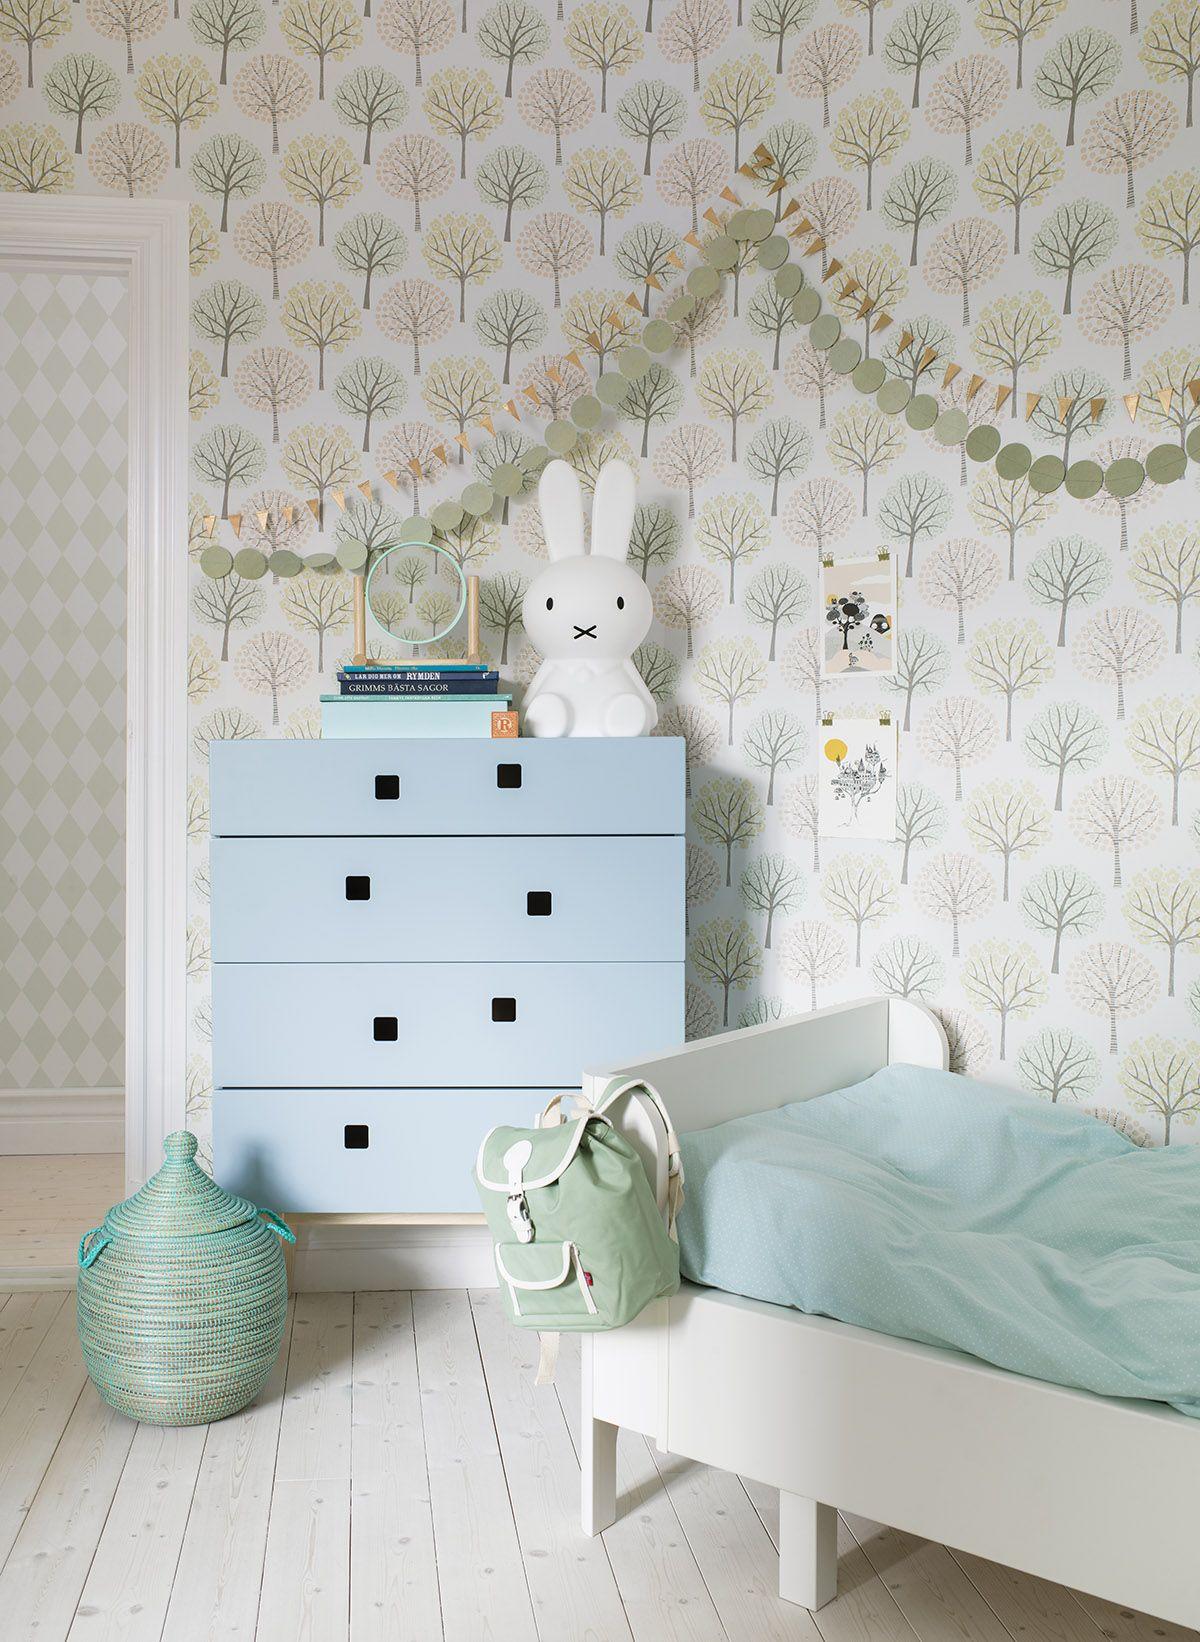 Decorama EASY UP 16 Eco Wallpaper Barn Pinterest